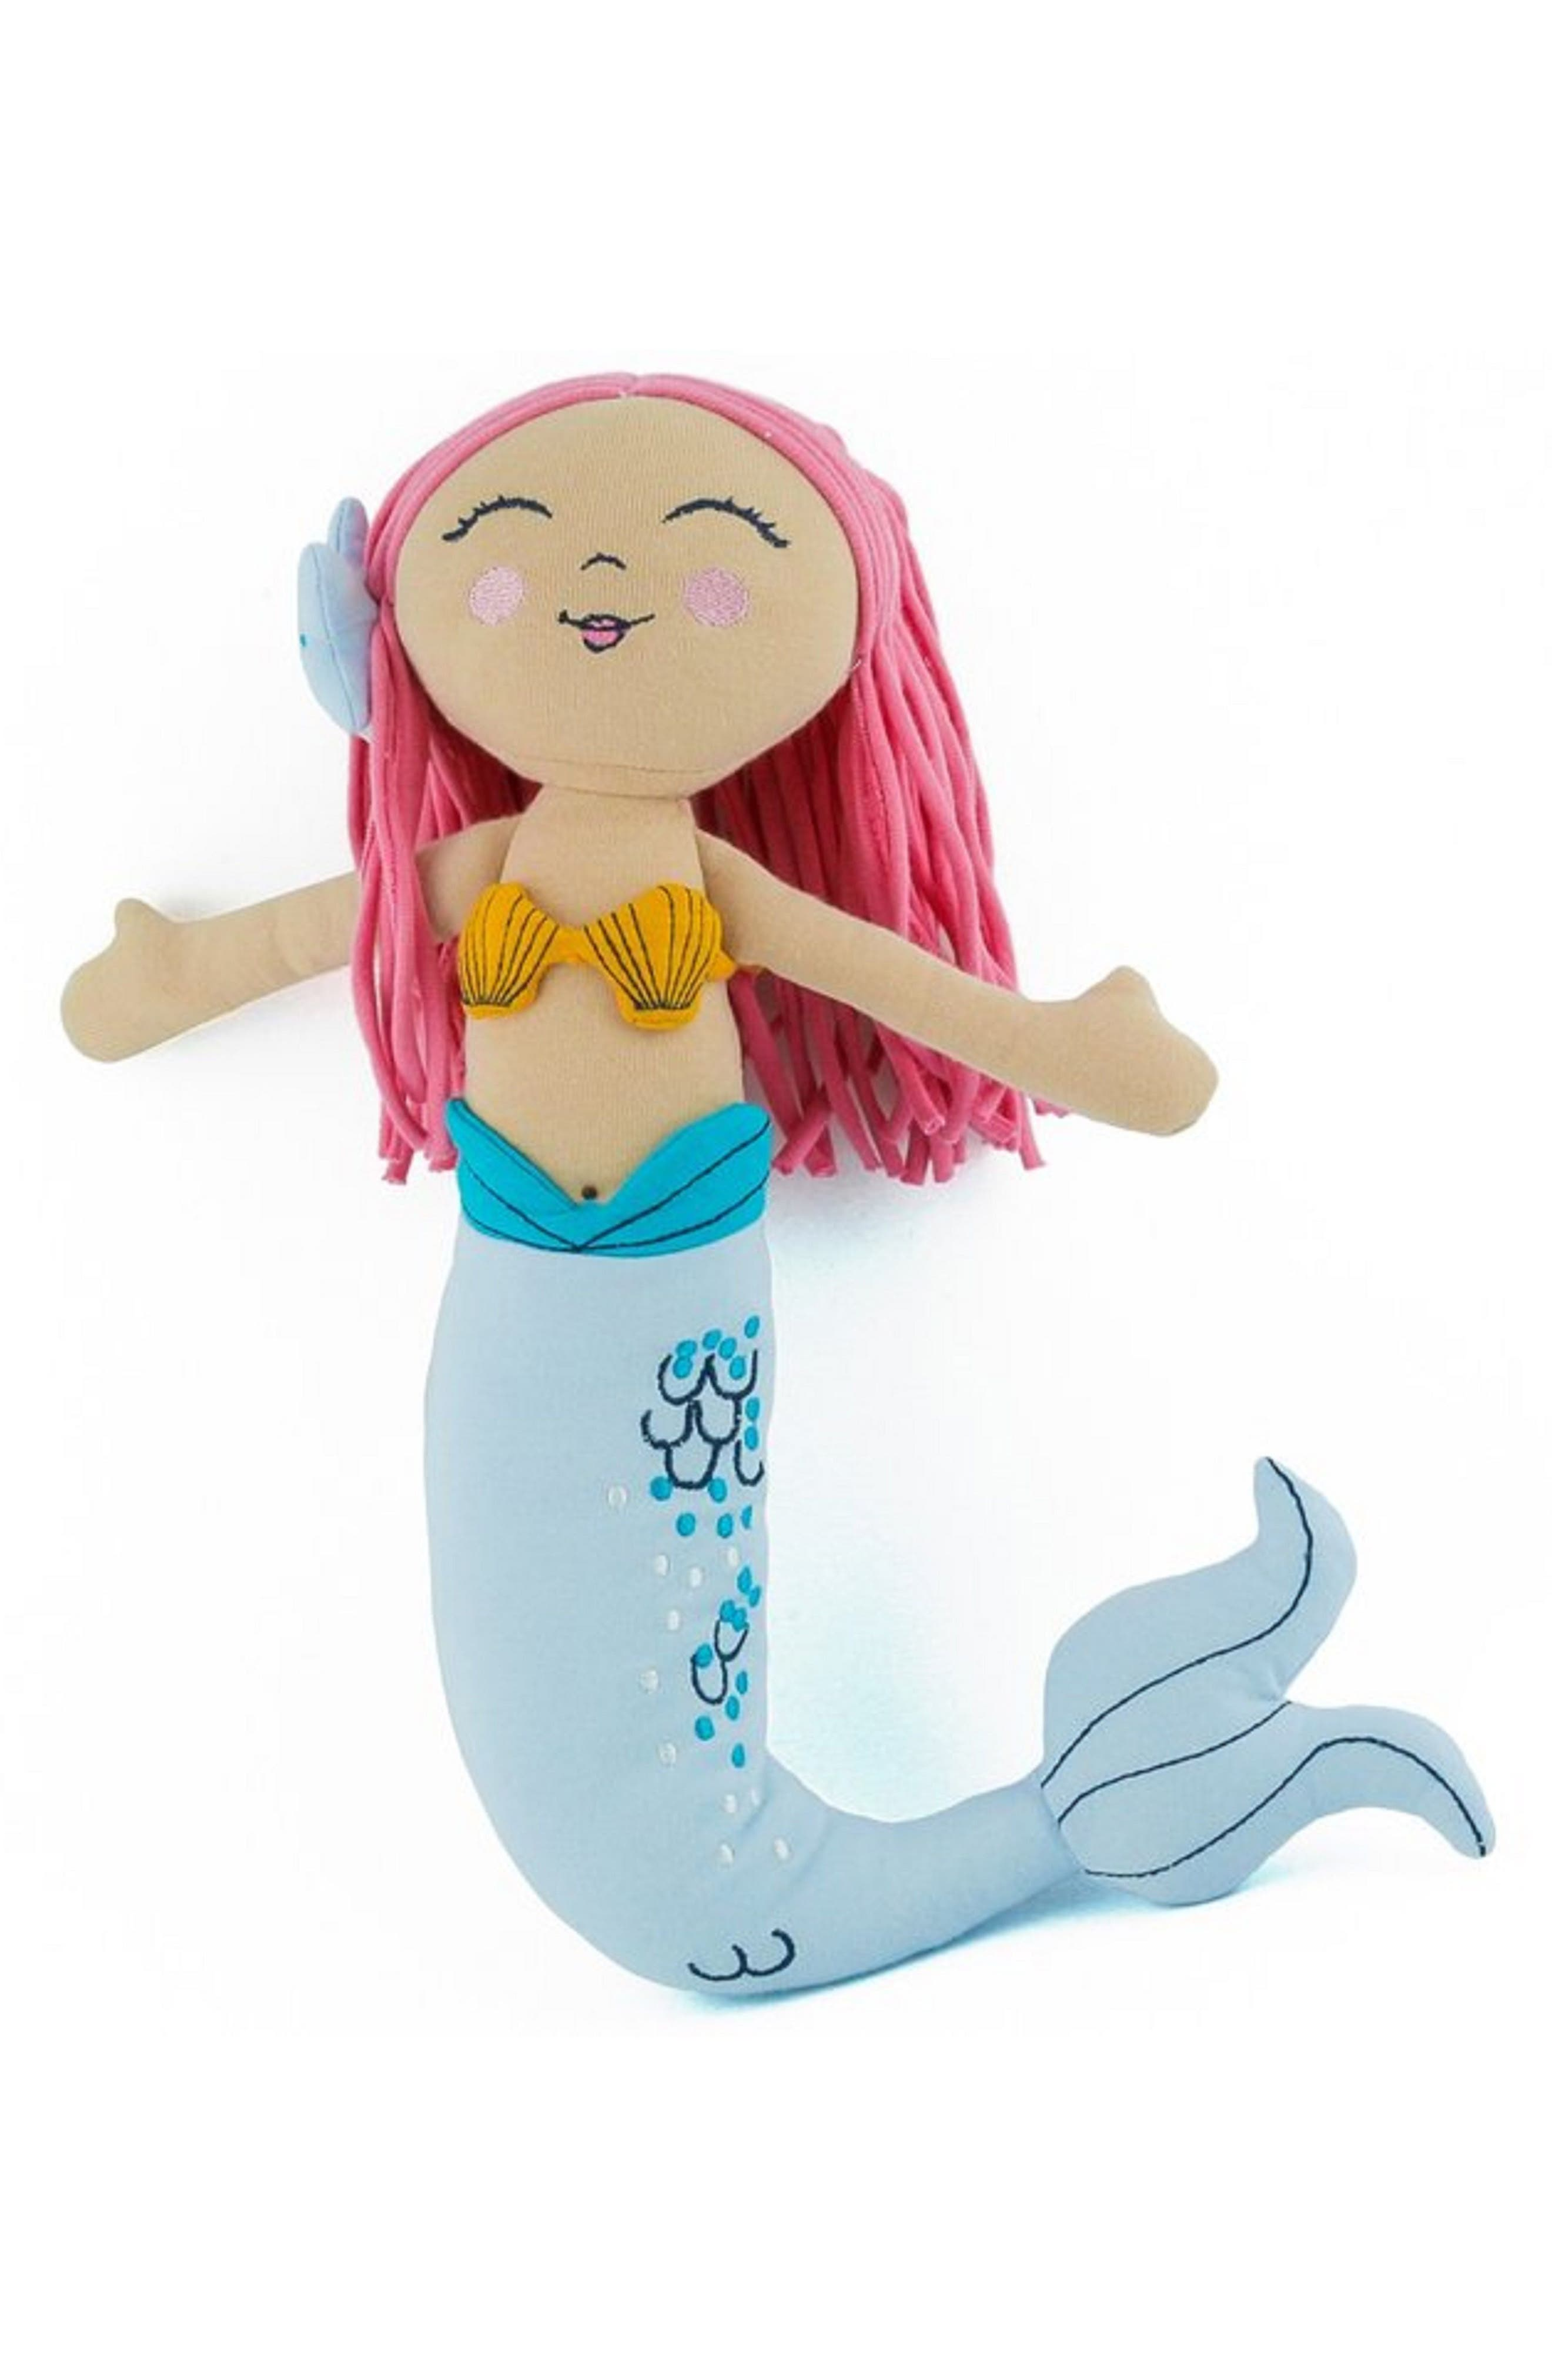 Ella Mermaid Stuffed Doll,                             Main thumbnail 1, color,                             Blue